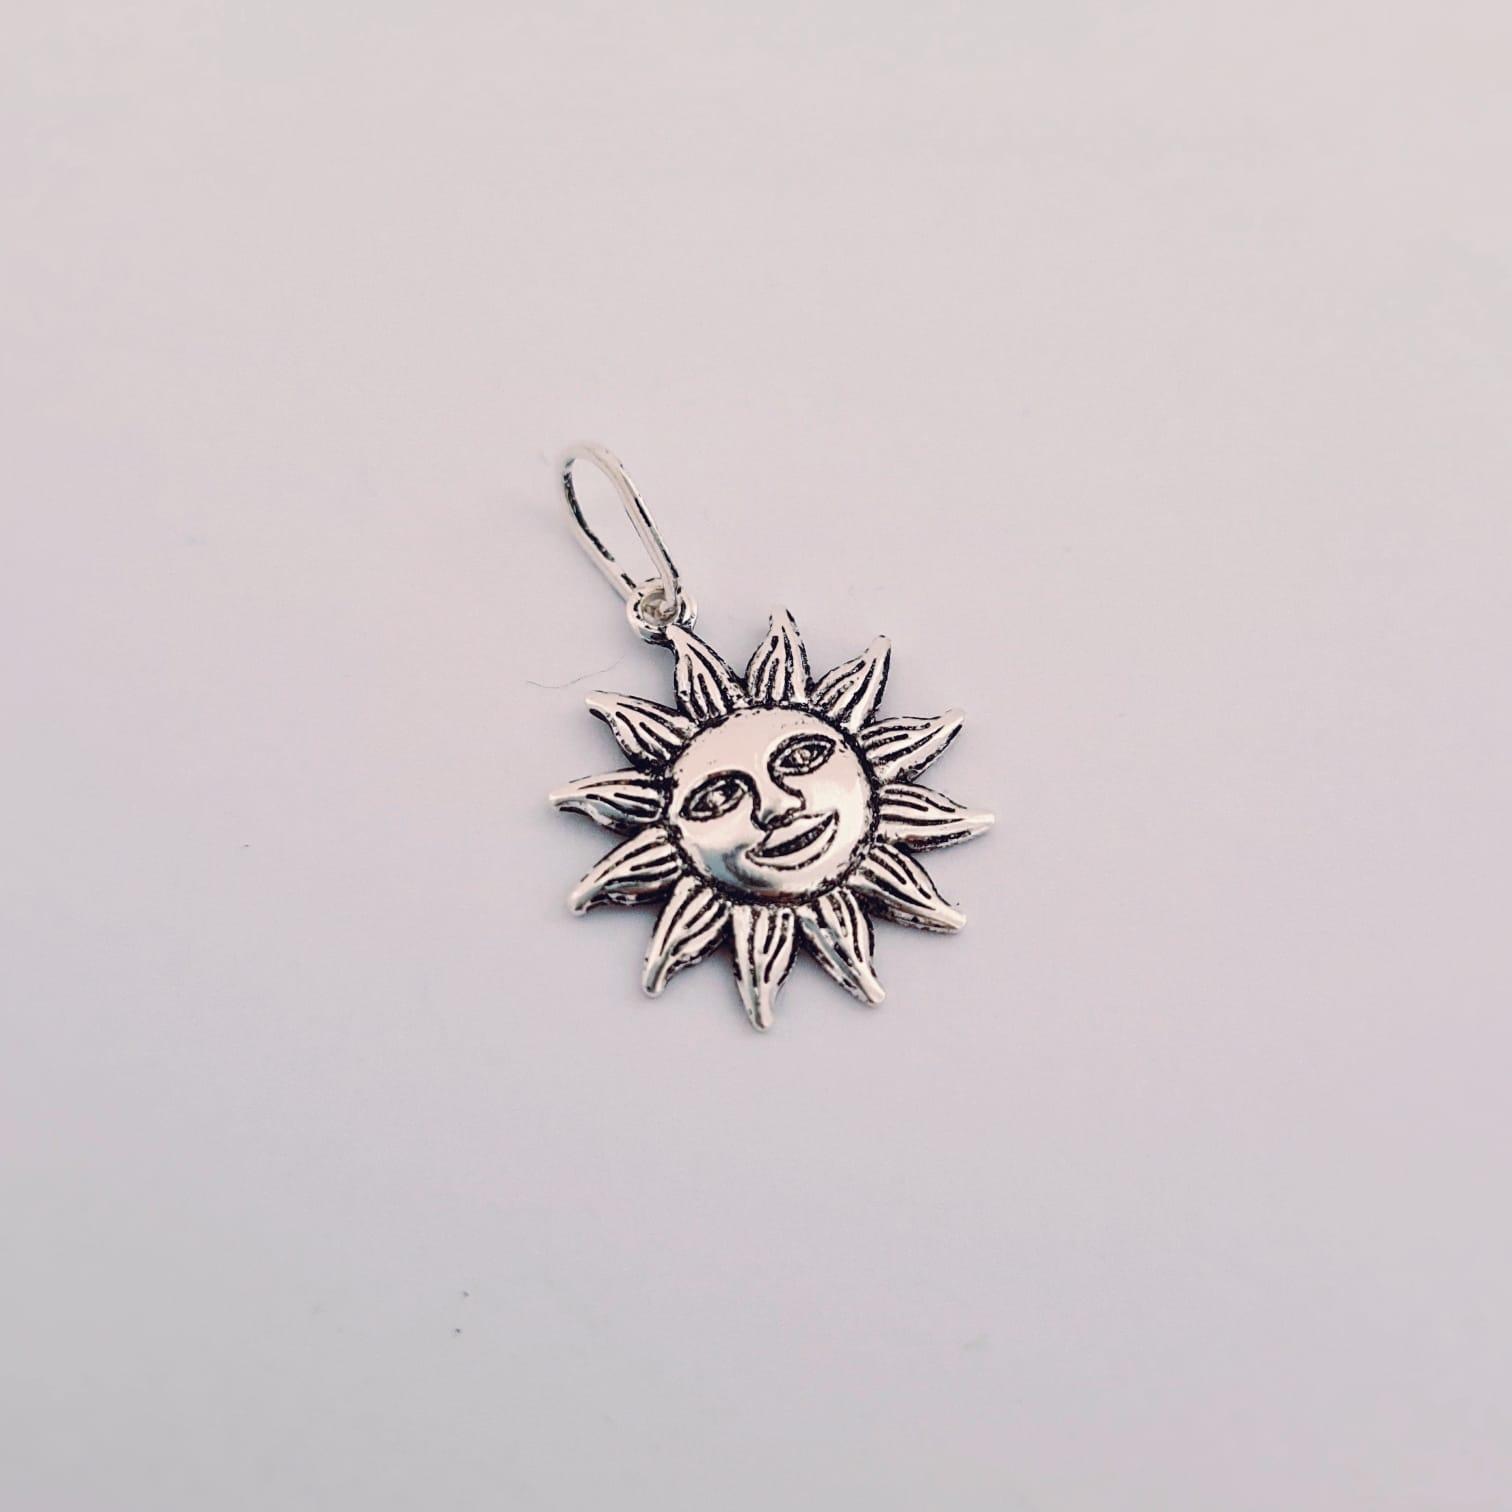 Pingente de Prata Raio de Sol